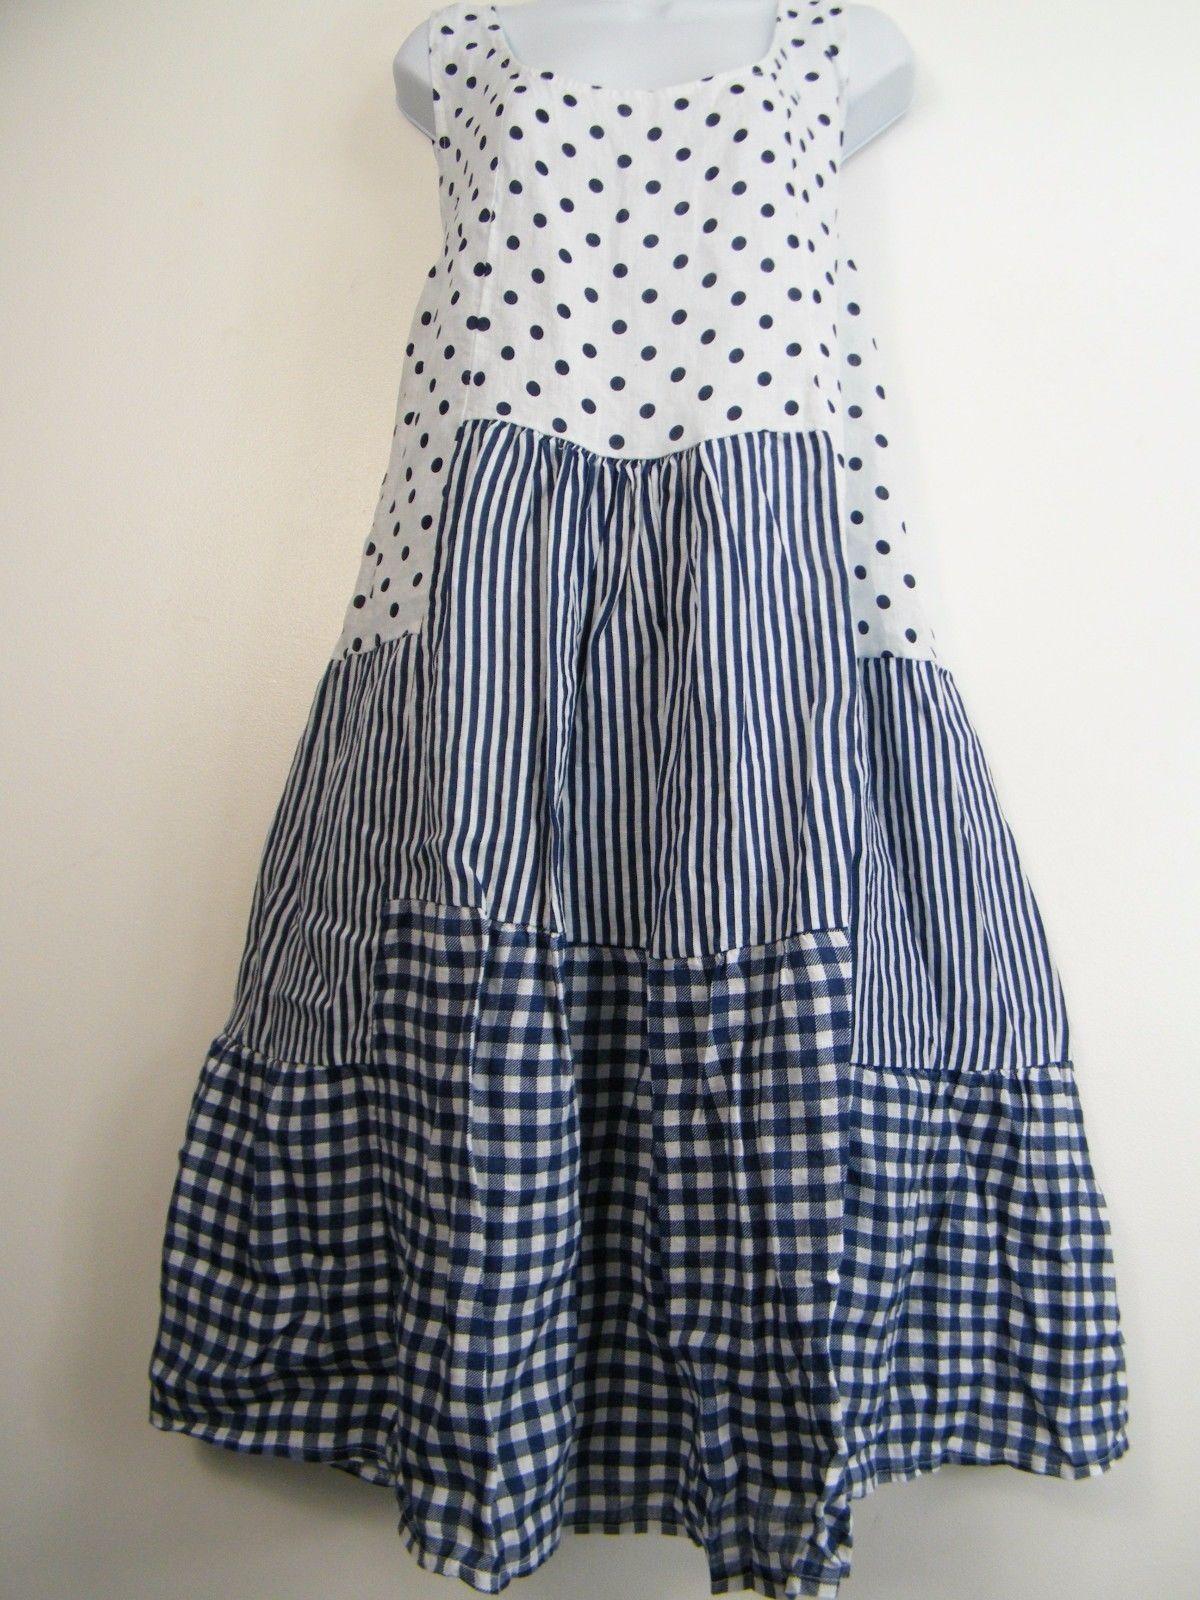 cda72a69f15 PLUS PLUS SIZE 100% LINEN SPOTTY STRIPY CHECK DESIGN LAGENLOOK DRESS SIZE  20-24 in Clothes